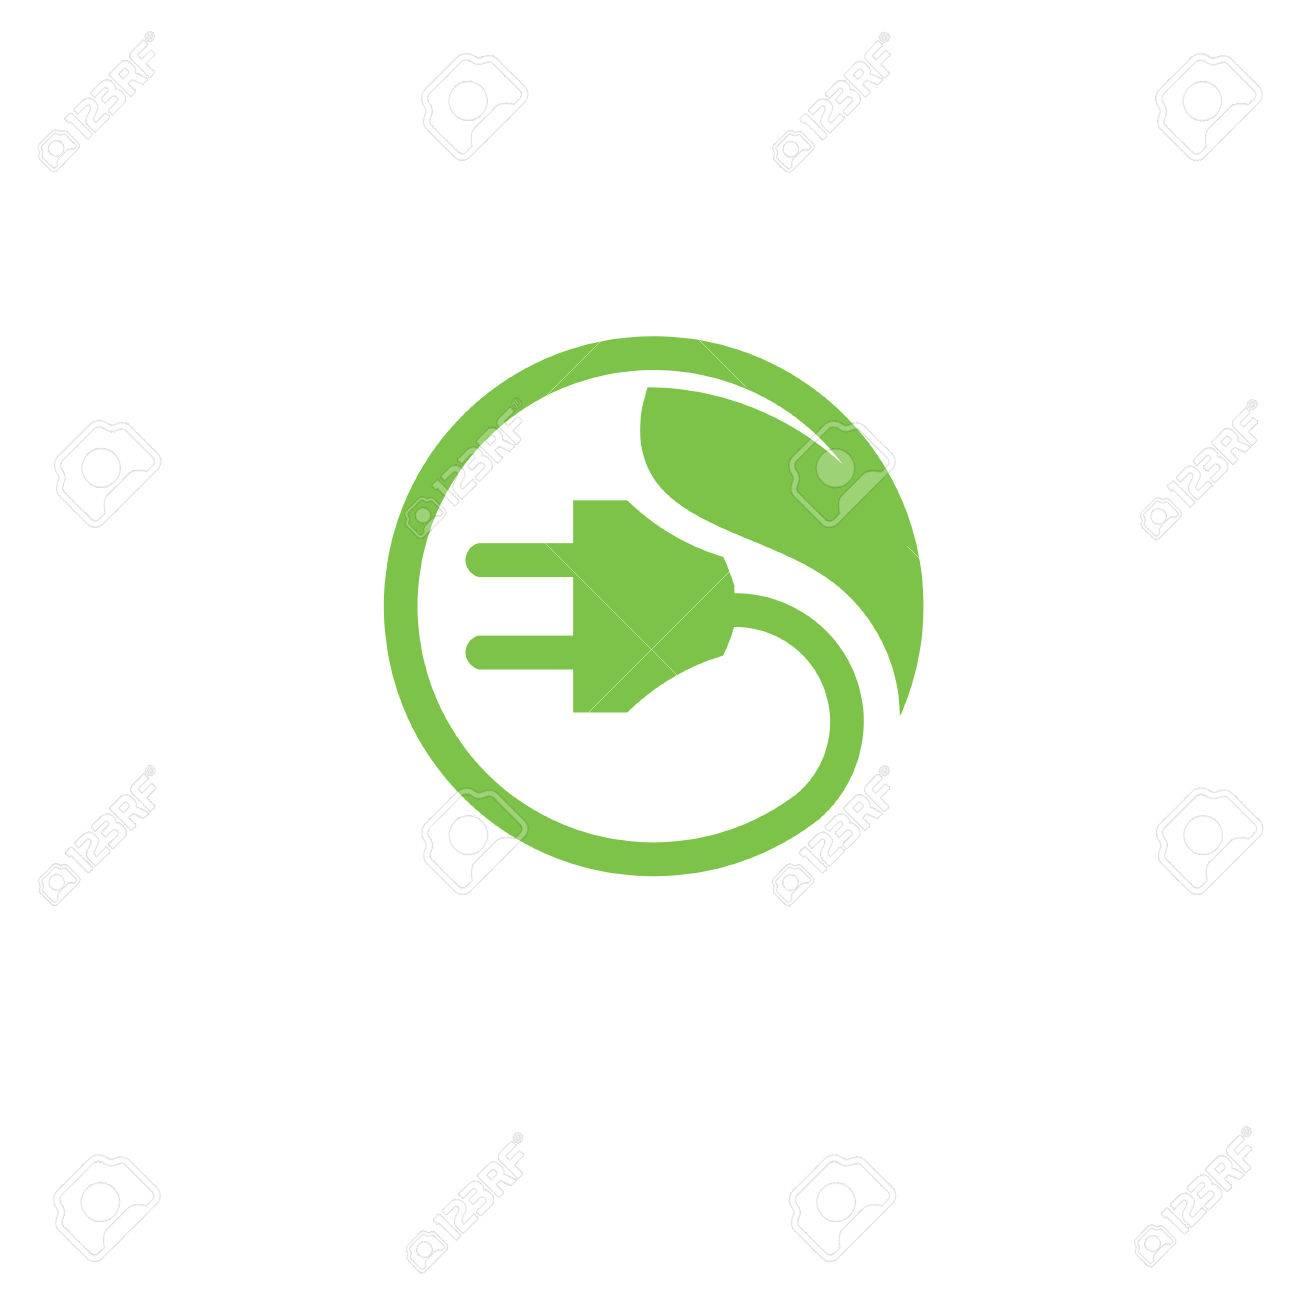 Green Energy Electrical Plug. Eco Energy Power Logo Circle Abstract ...